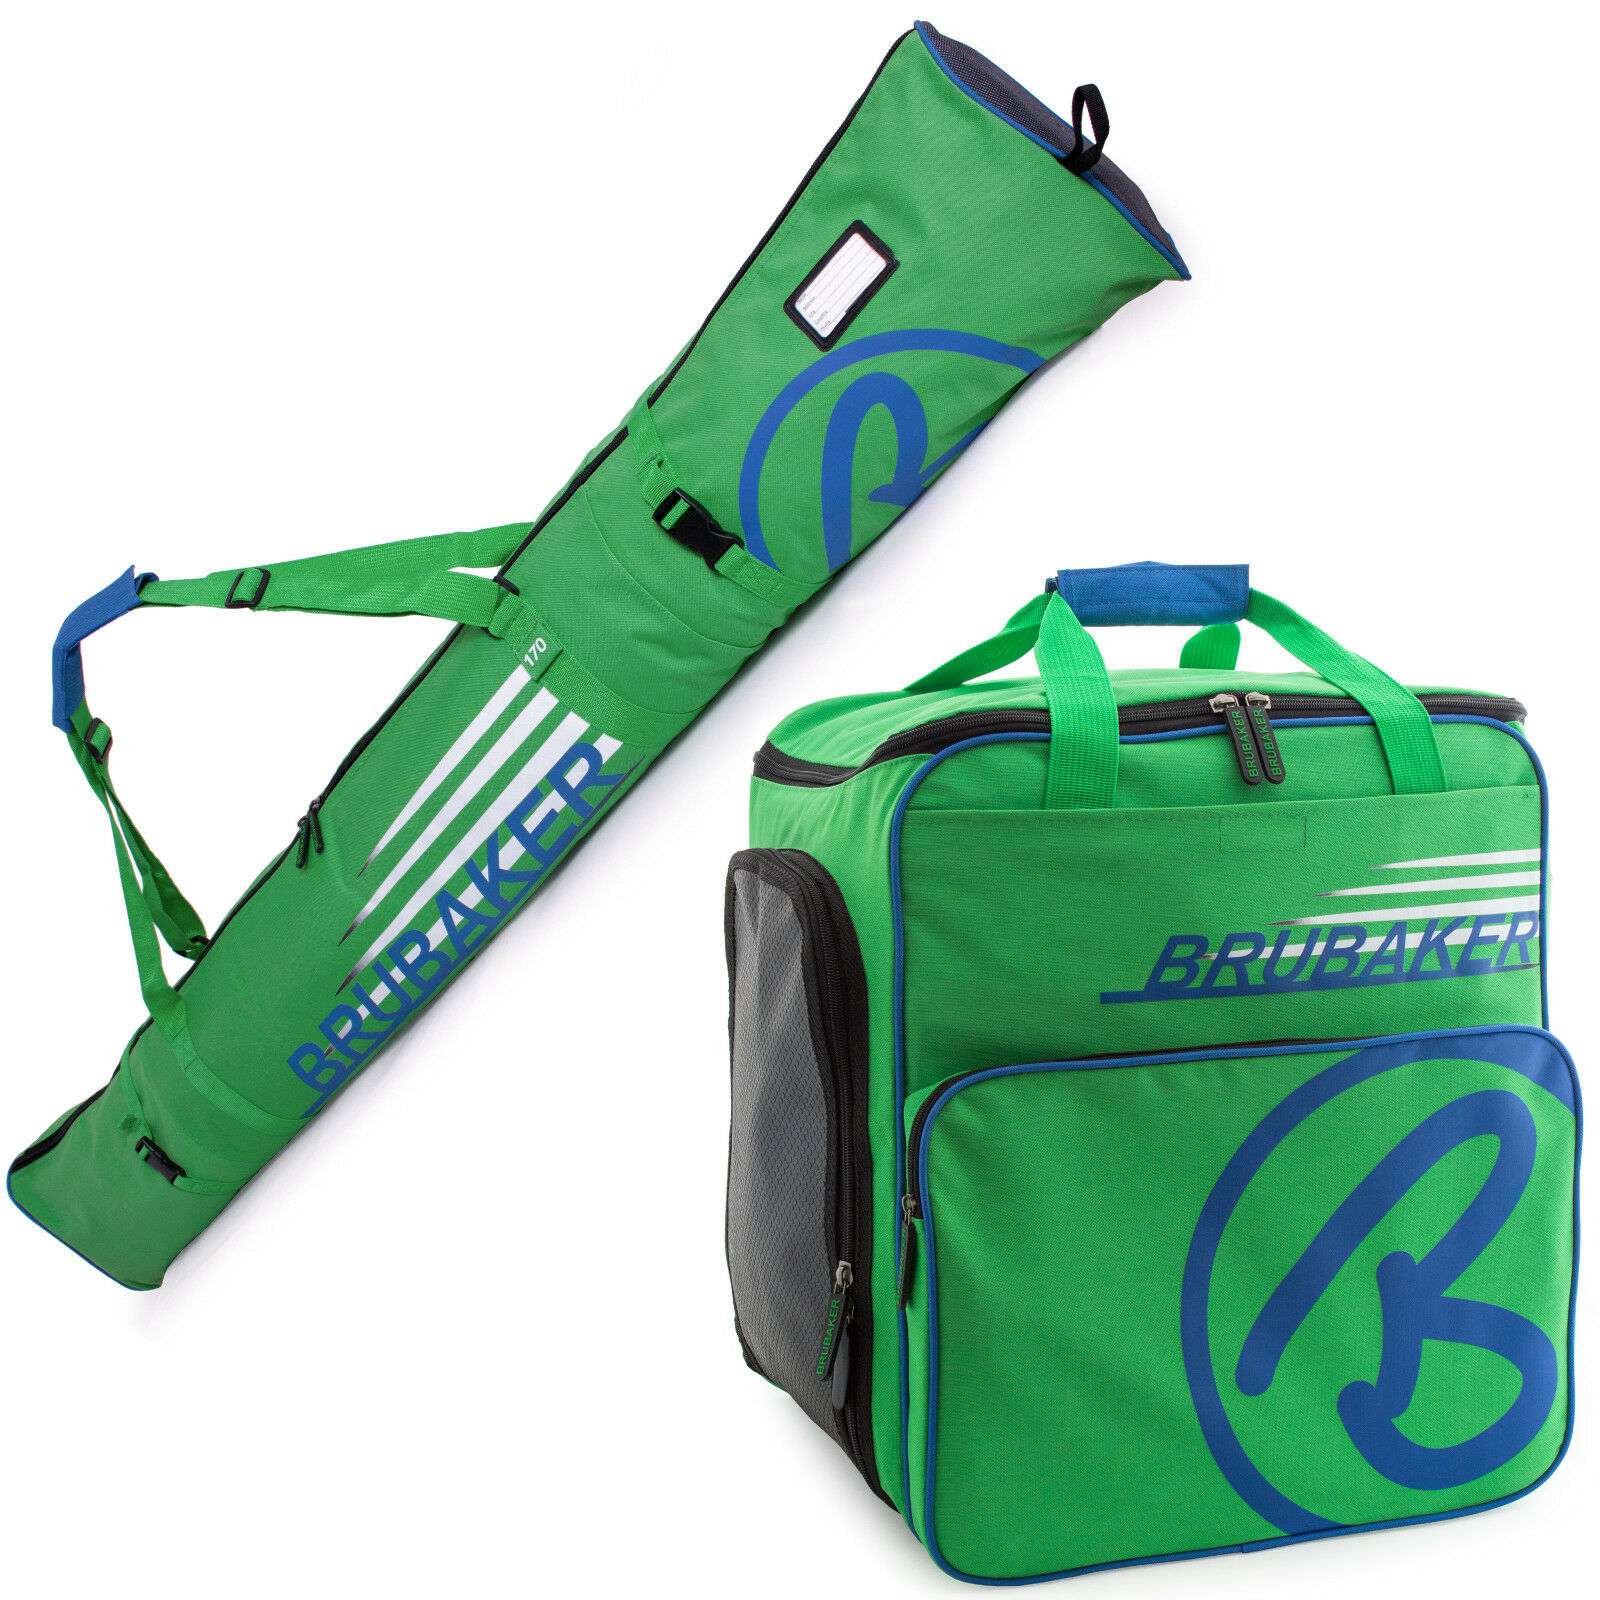 BRUBAKER 'Champion' set borsa porta sautoponi e sacca sci 170190cm verde blu